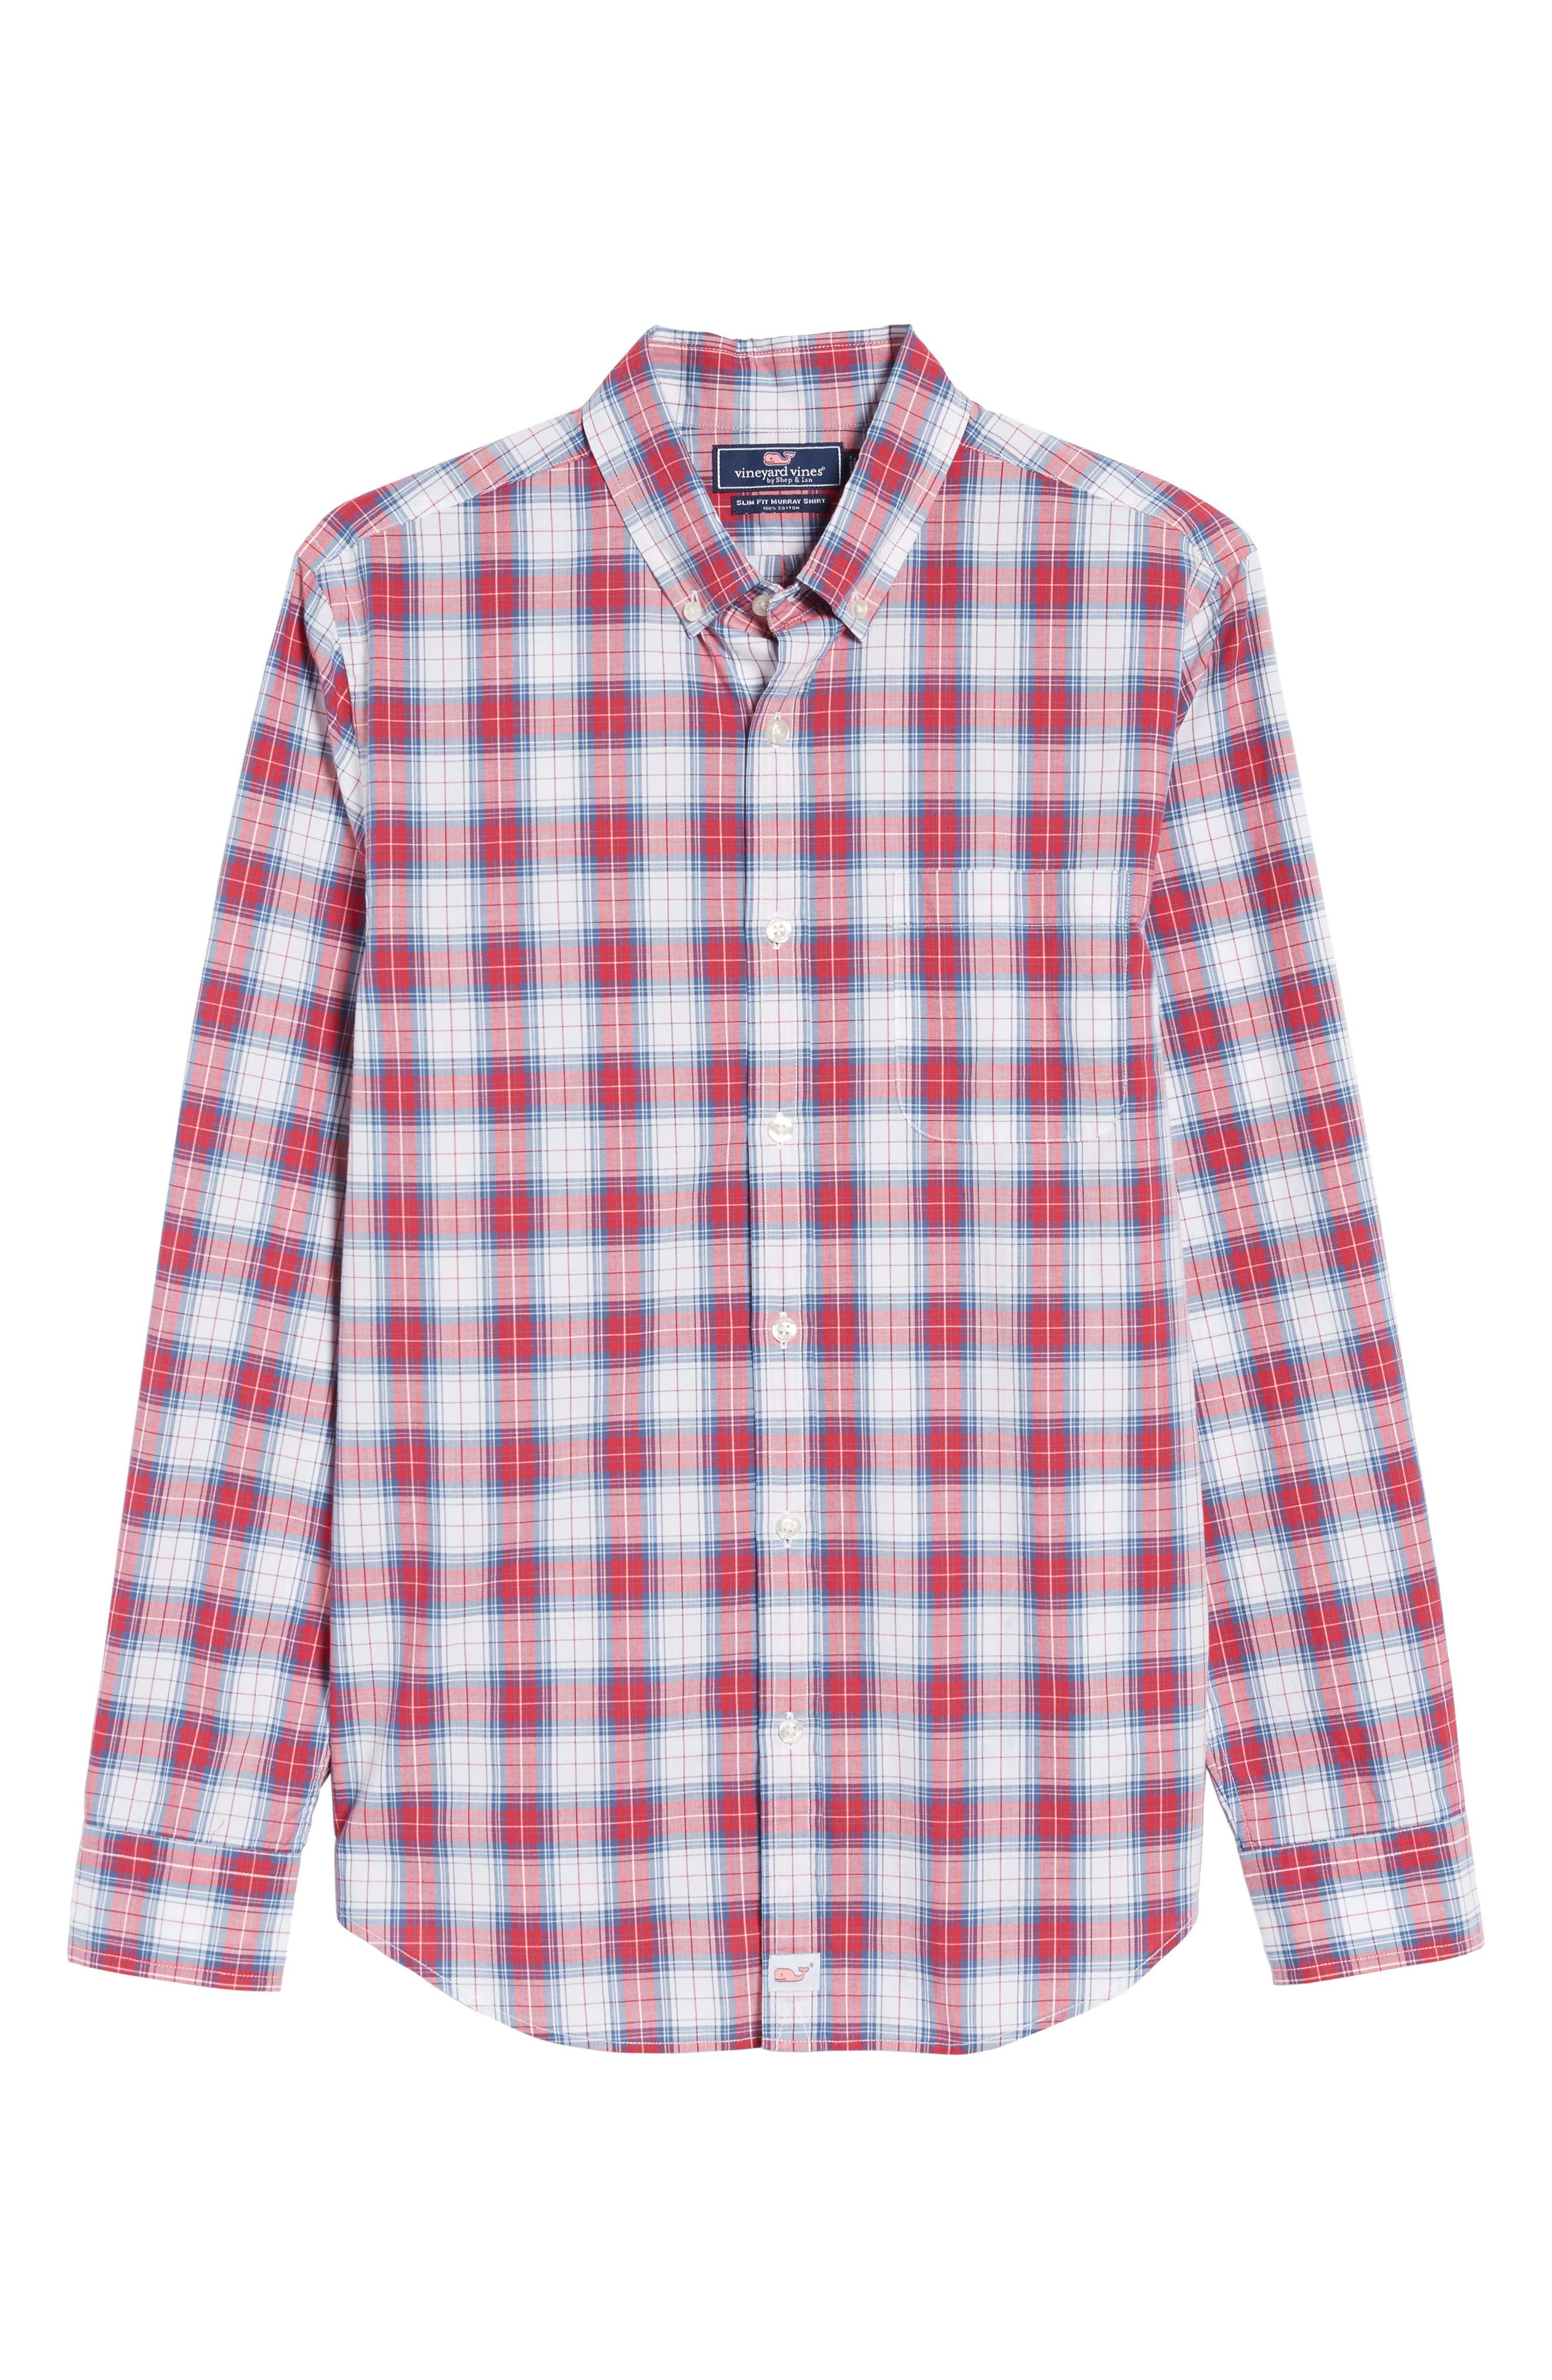 Murray Bucklin Point Slim Fit Plaid Sport Shirt,                             Alternate thumbnail 6, color,